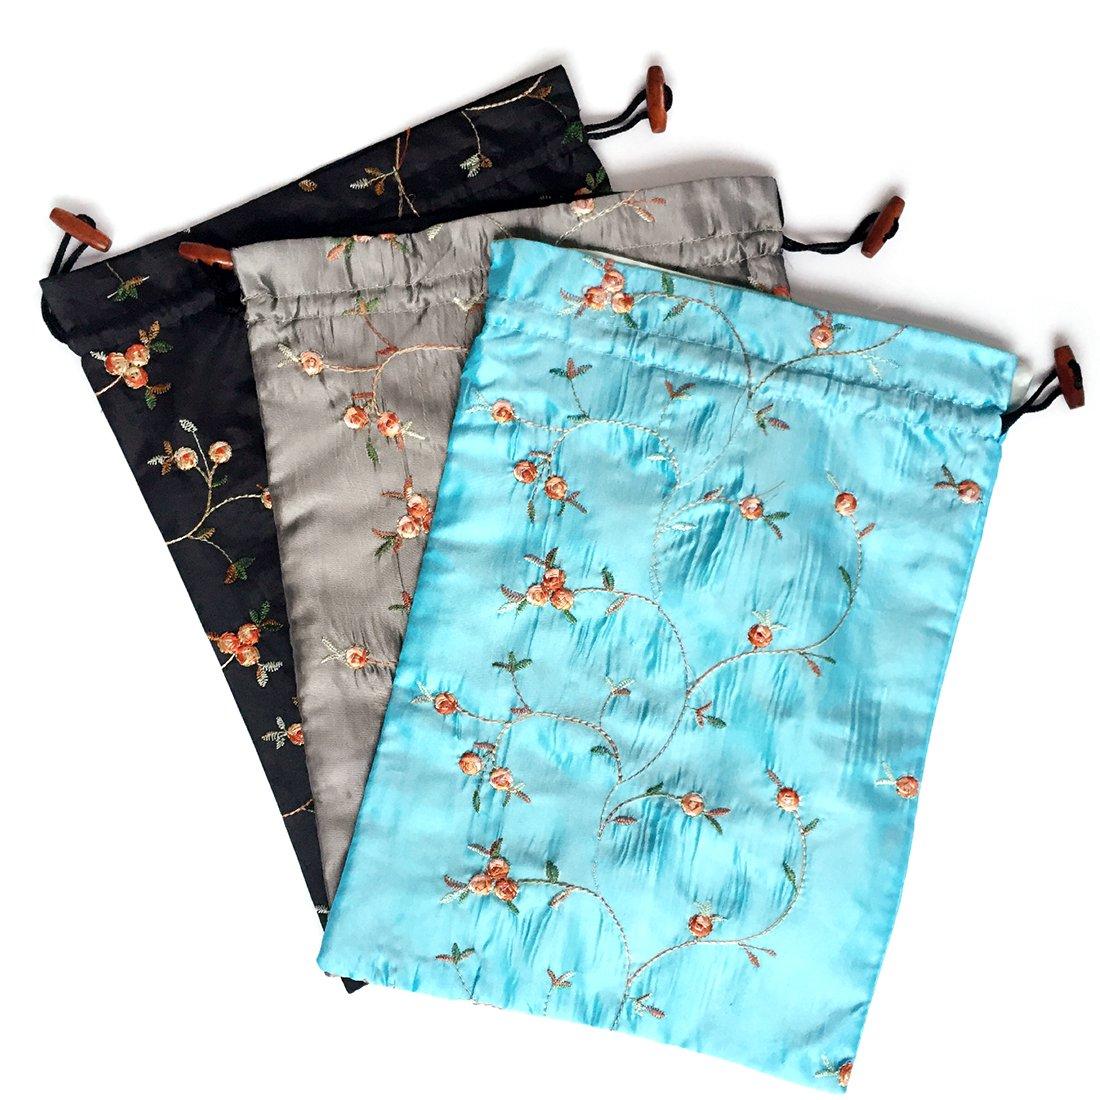 Elesa Miracle Embroidered Silk Jacquard Travel Bag, Lingerie & Shoes Bag, 3 Packs, Sky Blue, Black, Silver